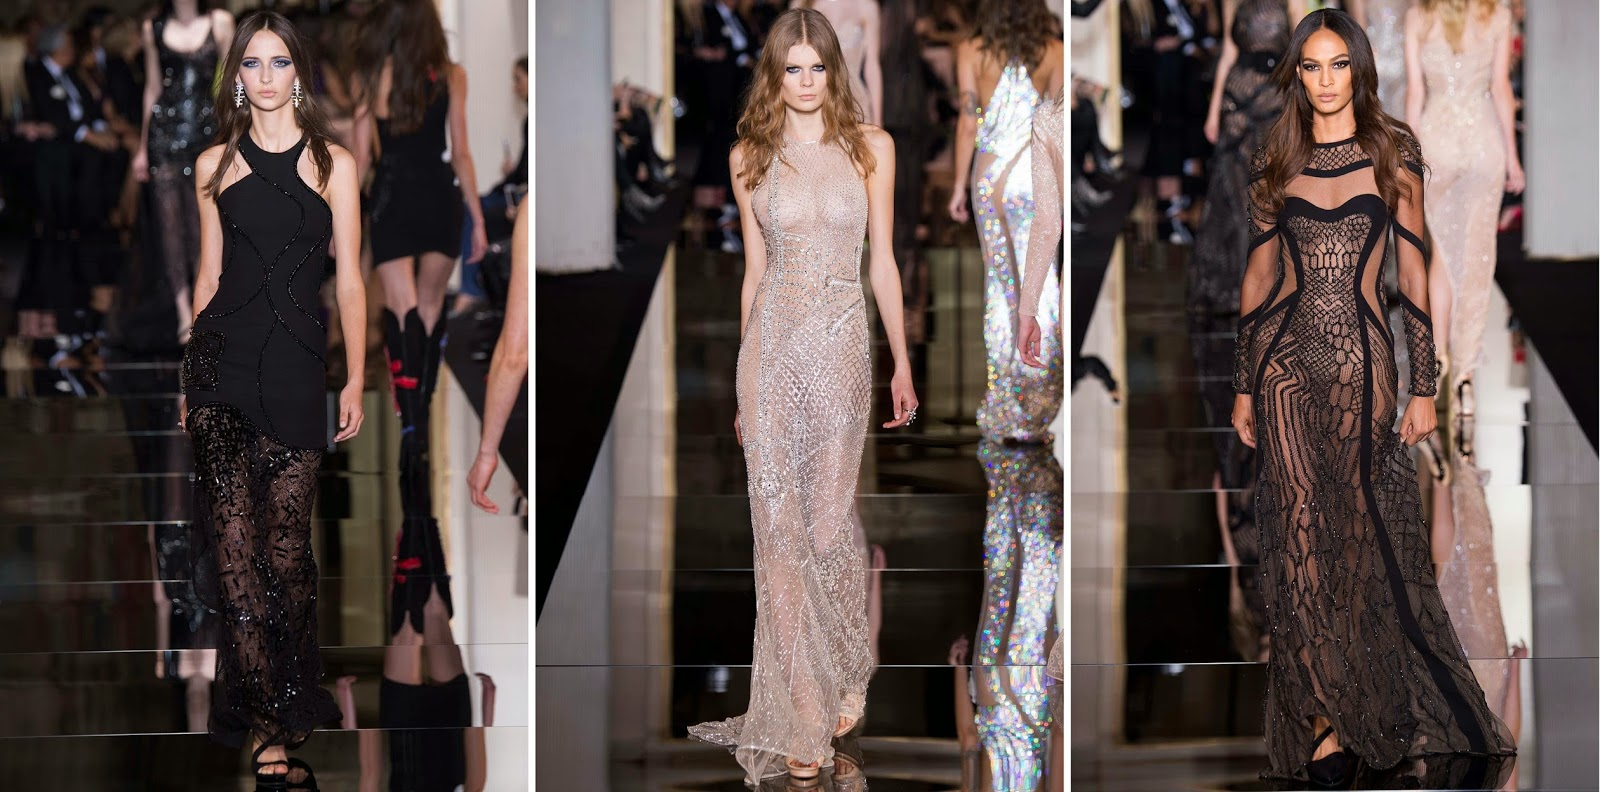 atelier-versace-haute-couture-paris-spring-2015